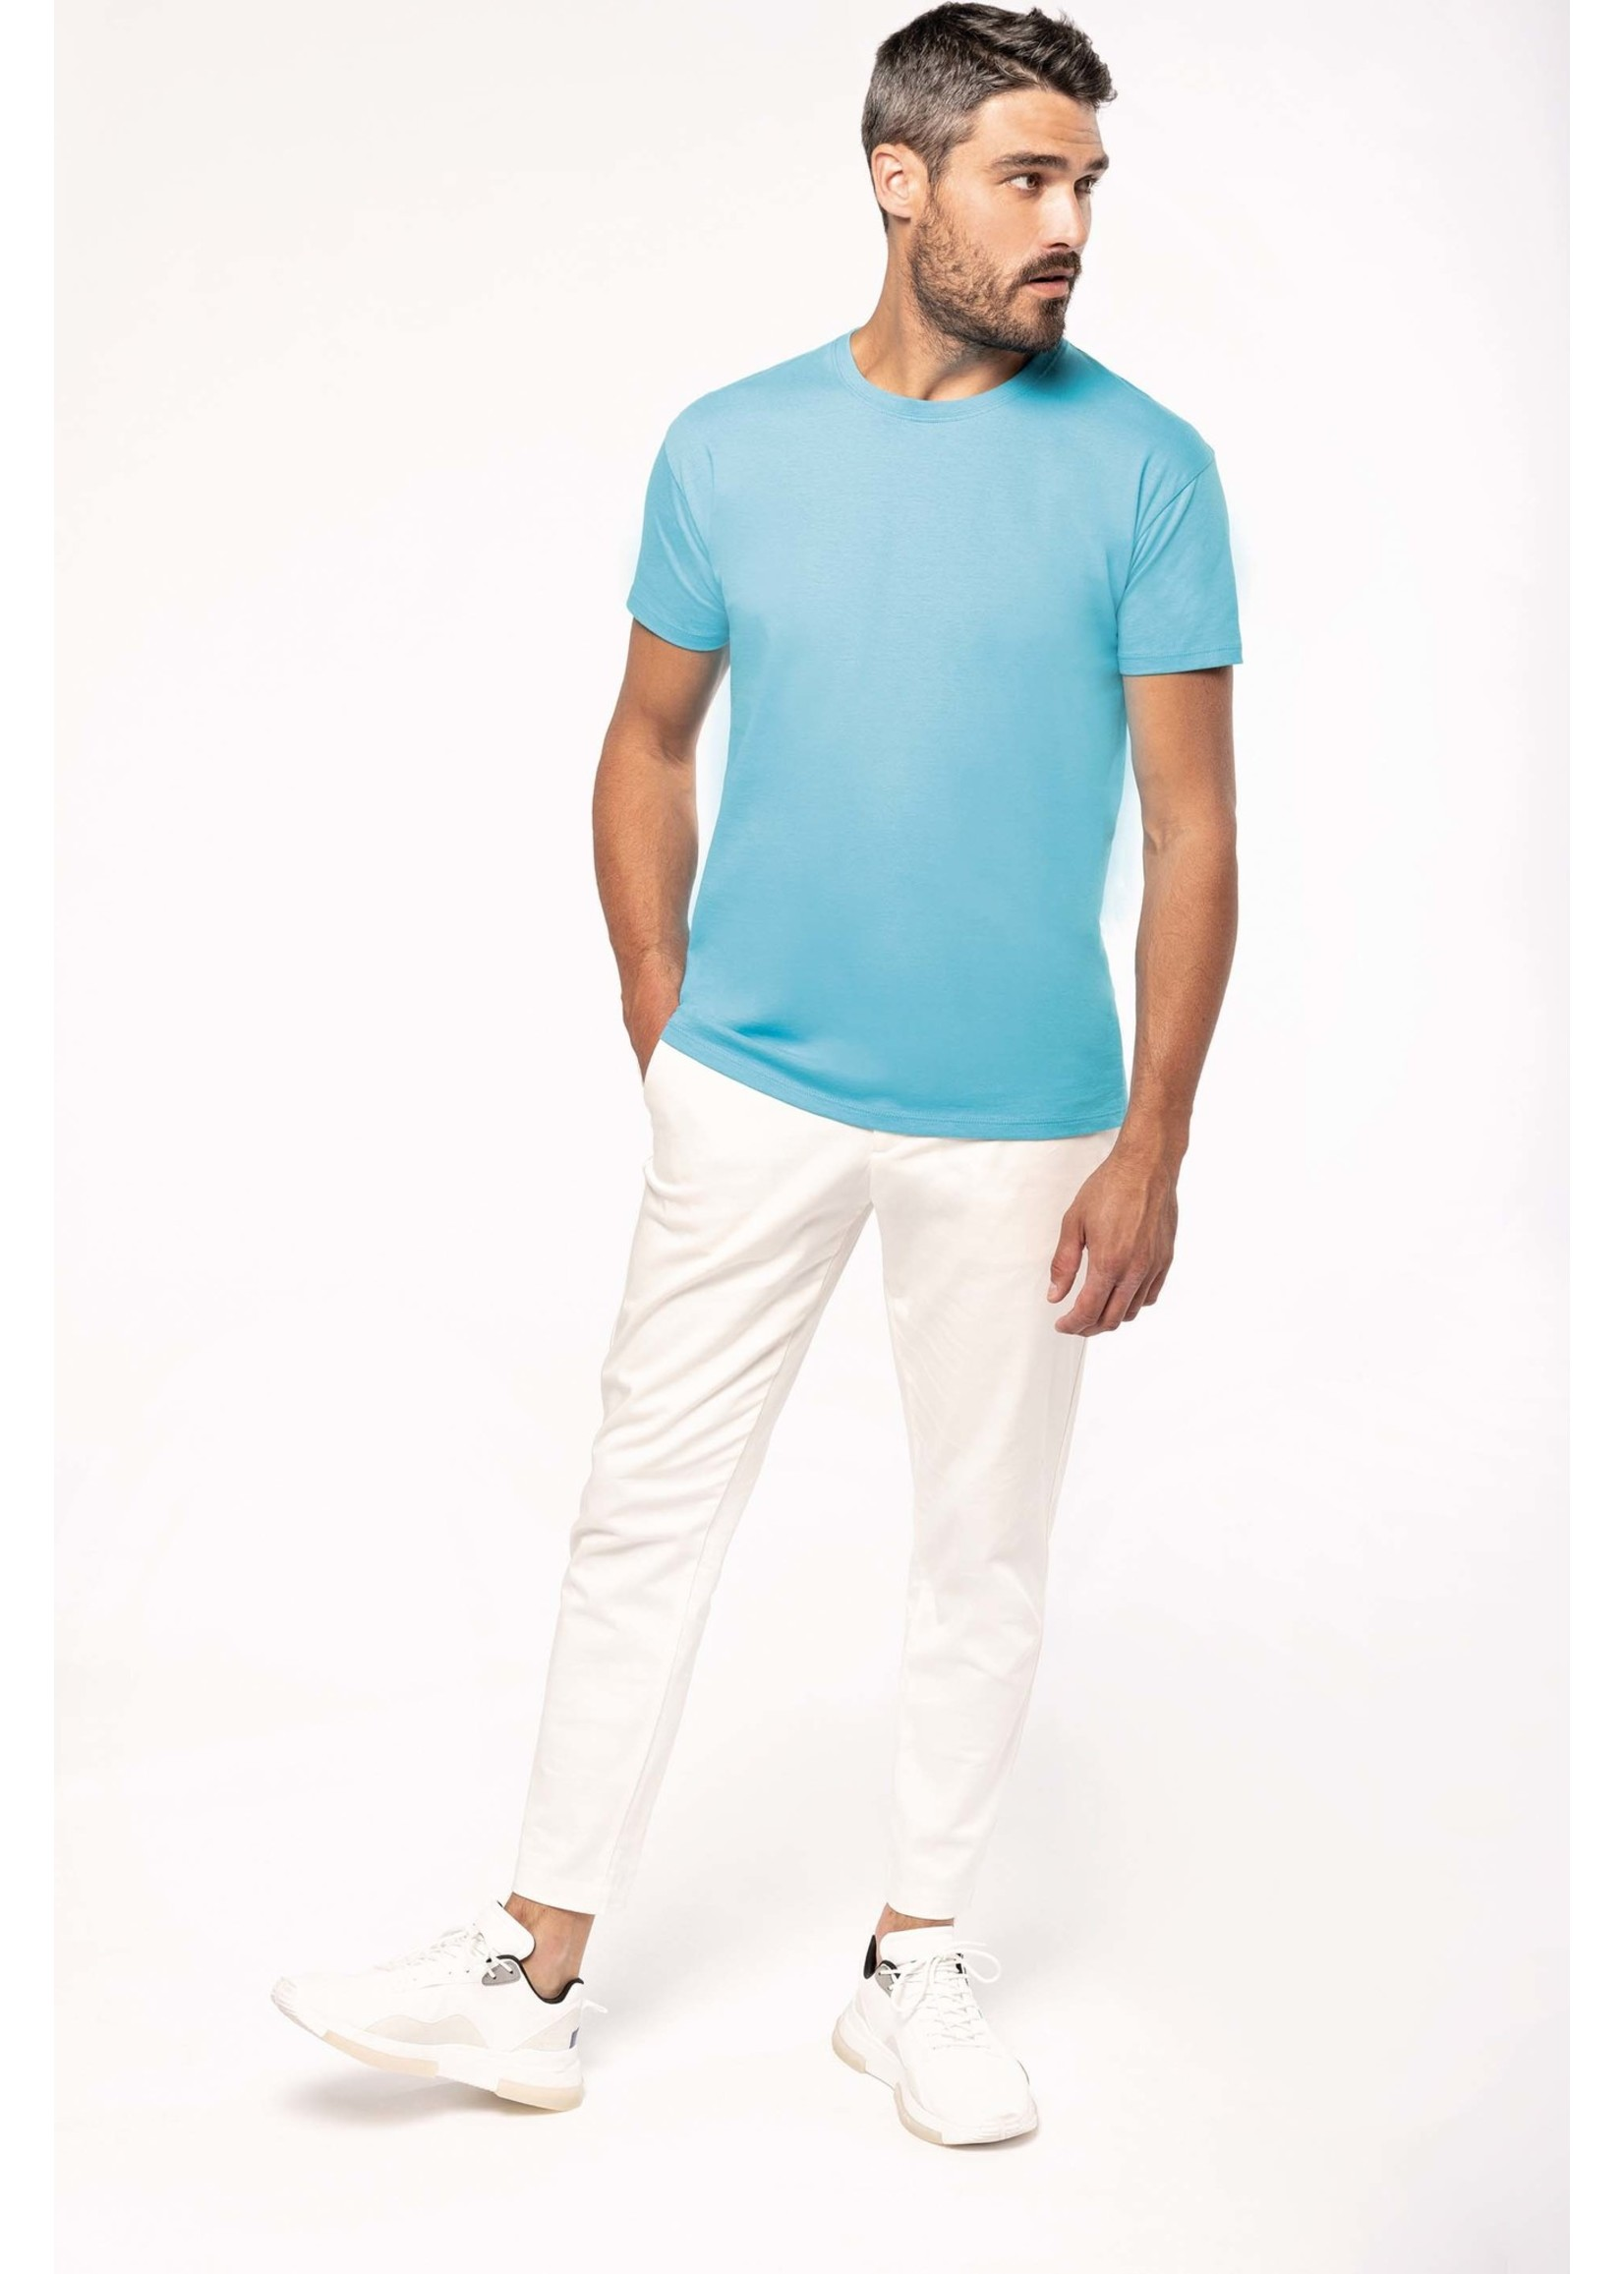 Eco-Friendly Unisex T-shirt -Oxford Grey